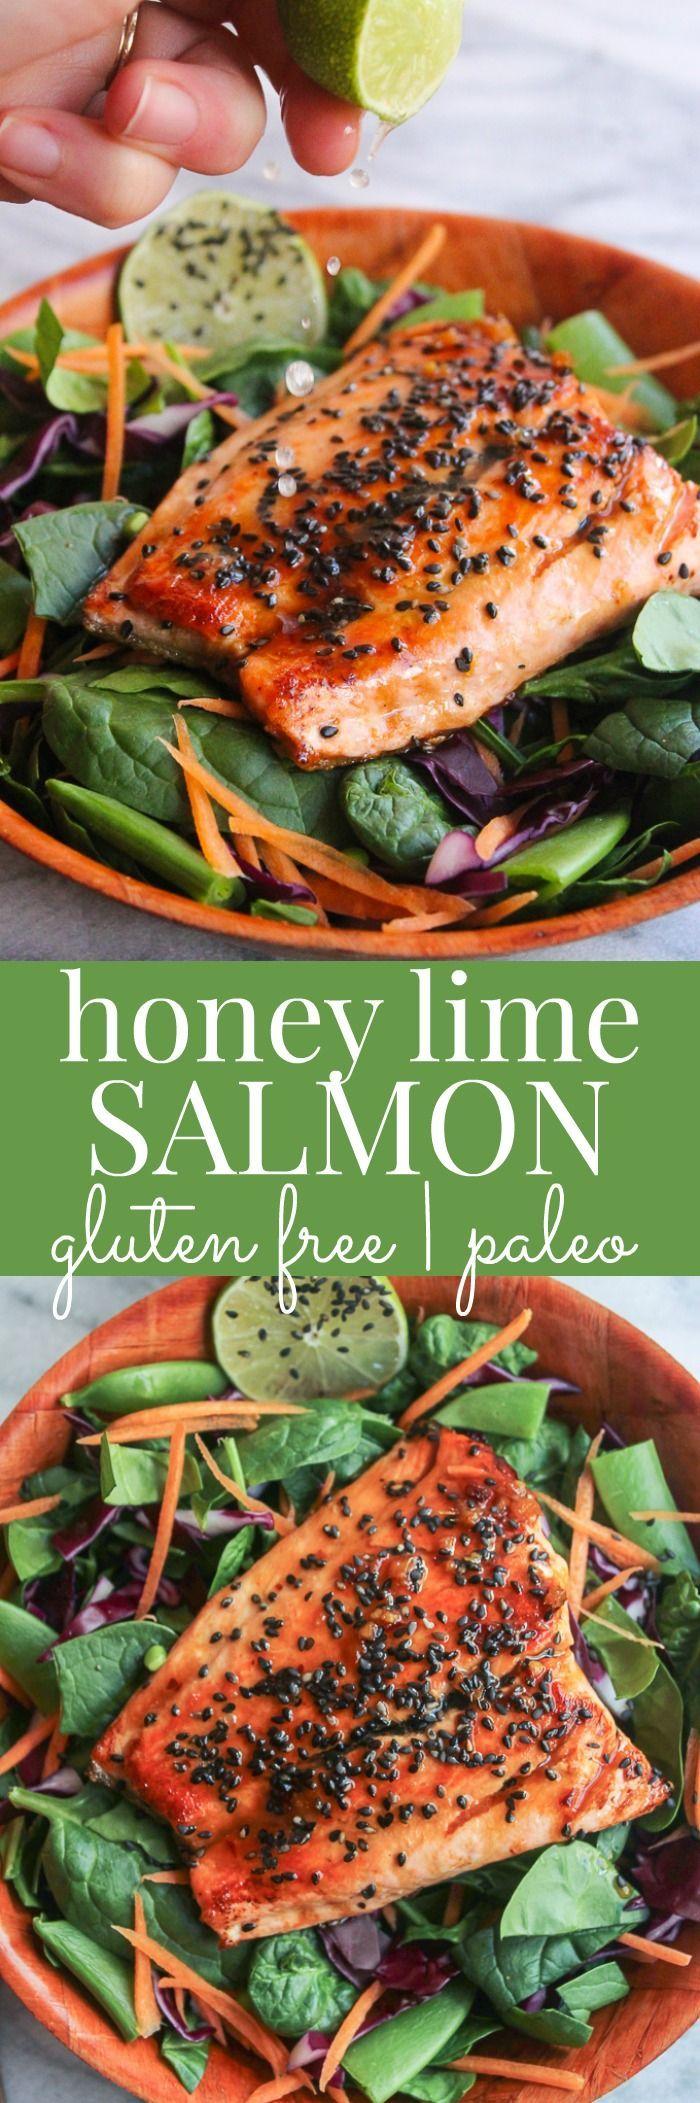 Honey Lime Salmon | gluten free & paleo friendly